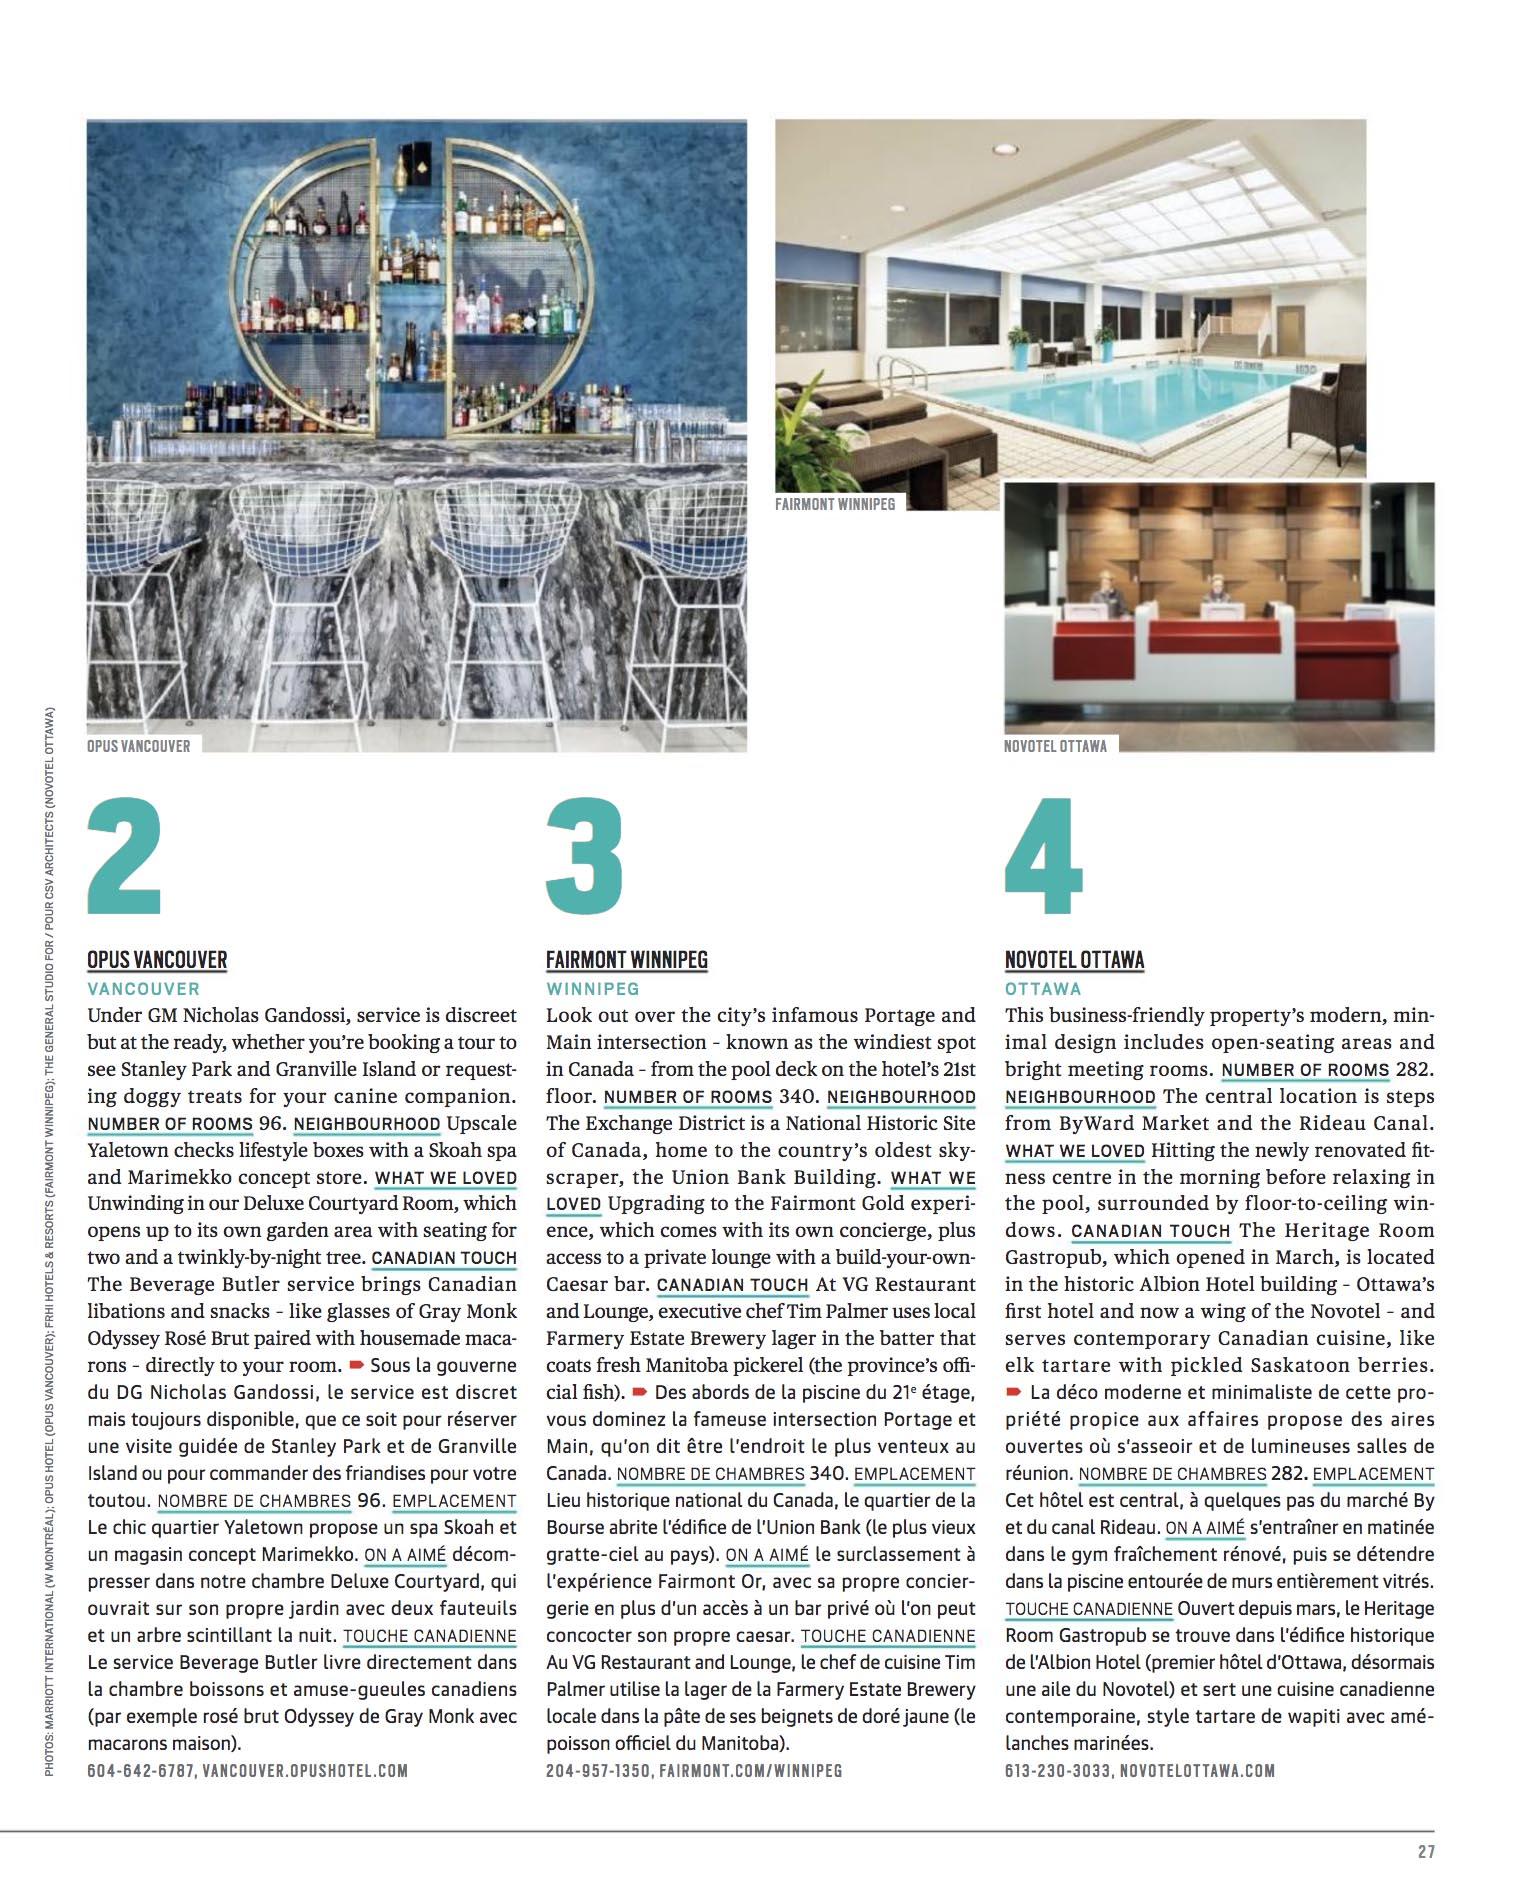 hotel_guide-copy.jpg